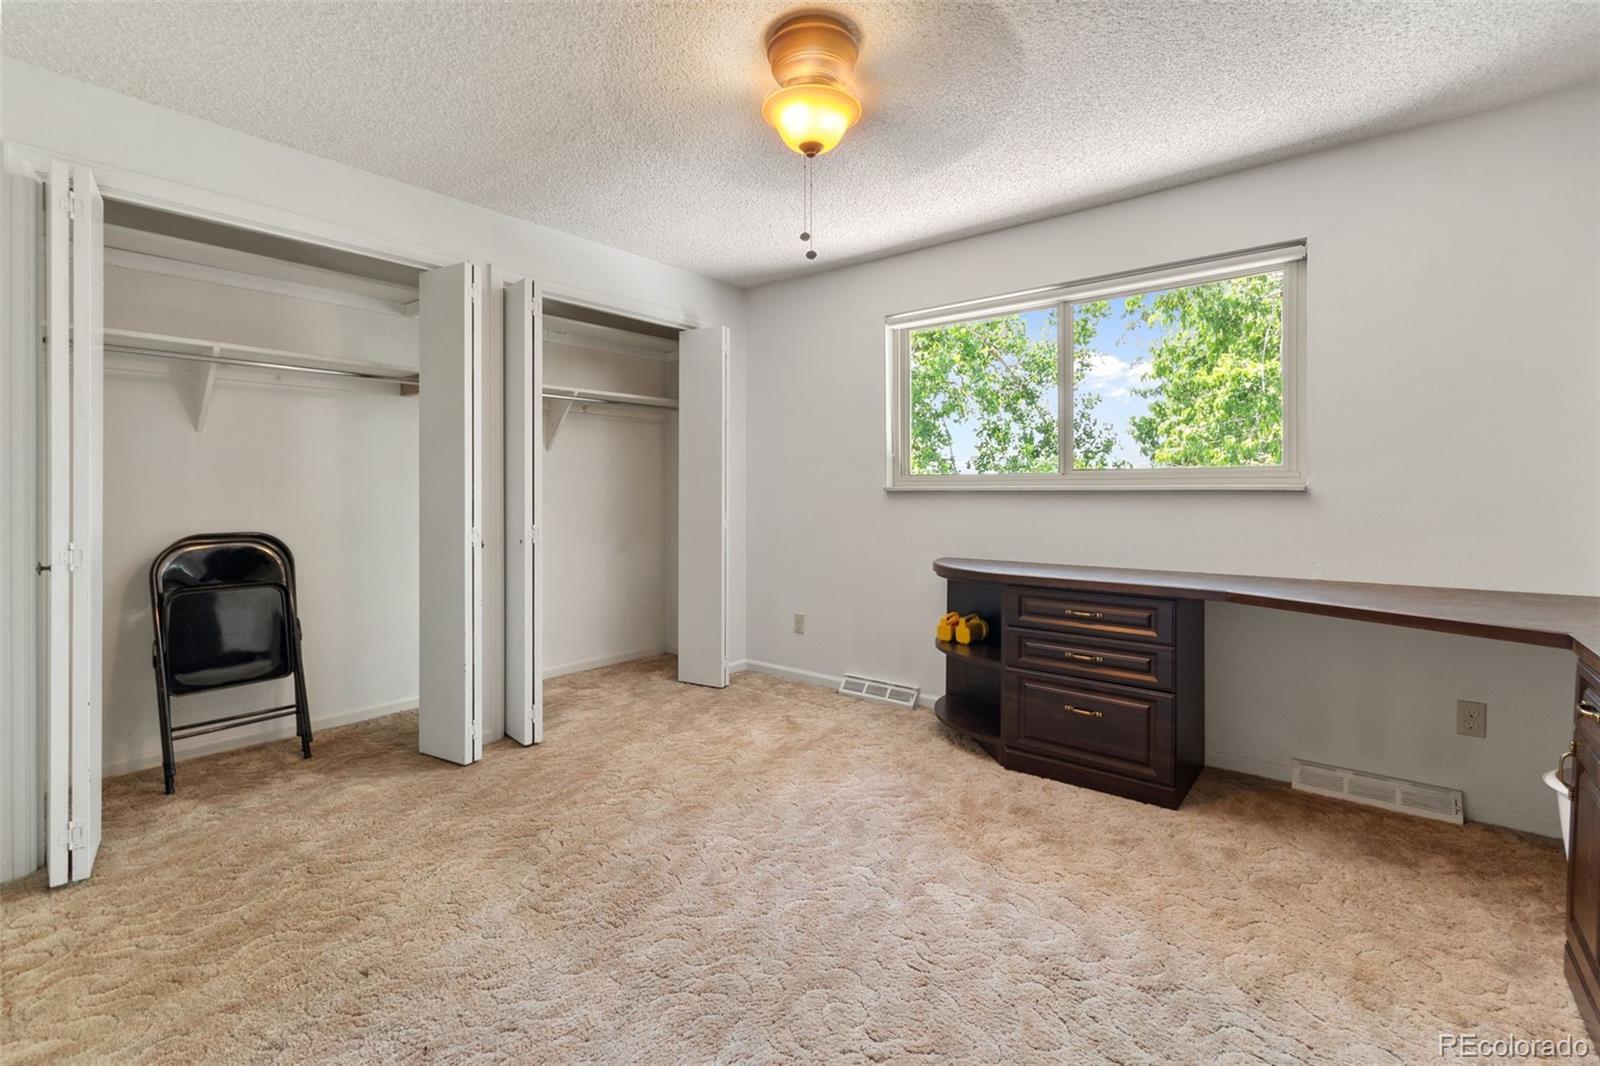 MLS# 7770404 - 25 - 2355 S Hoyt Street, Lakewood, CO 80227